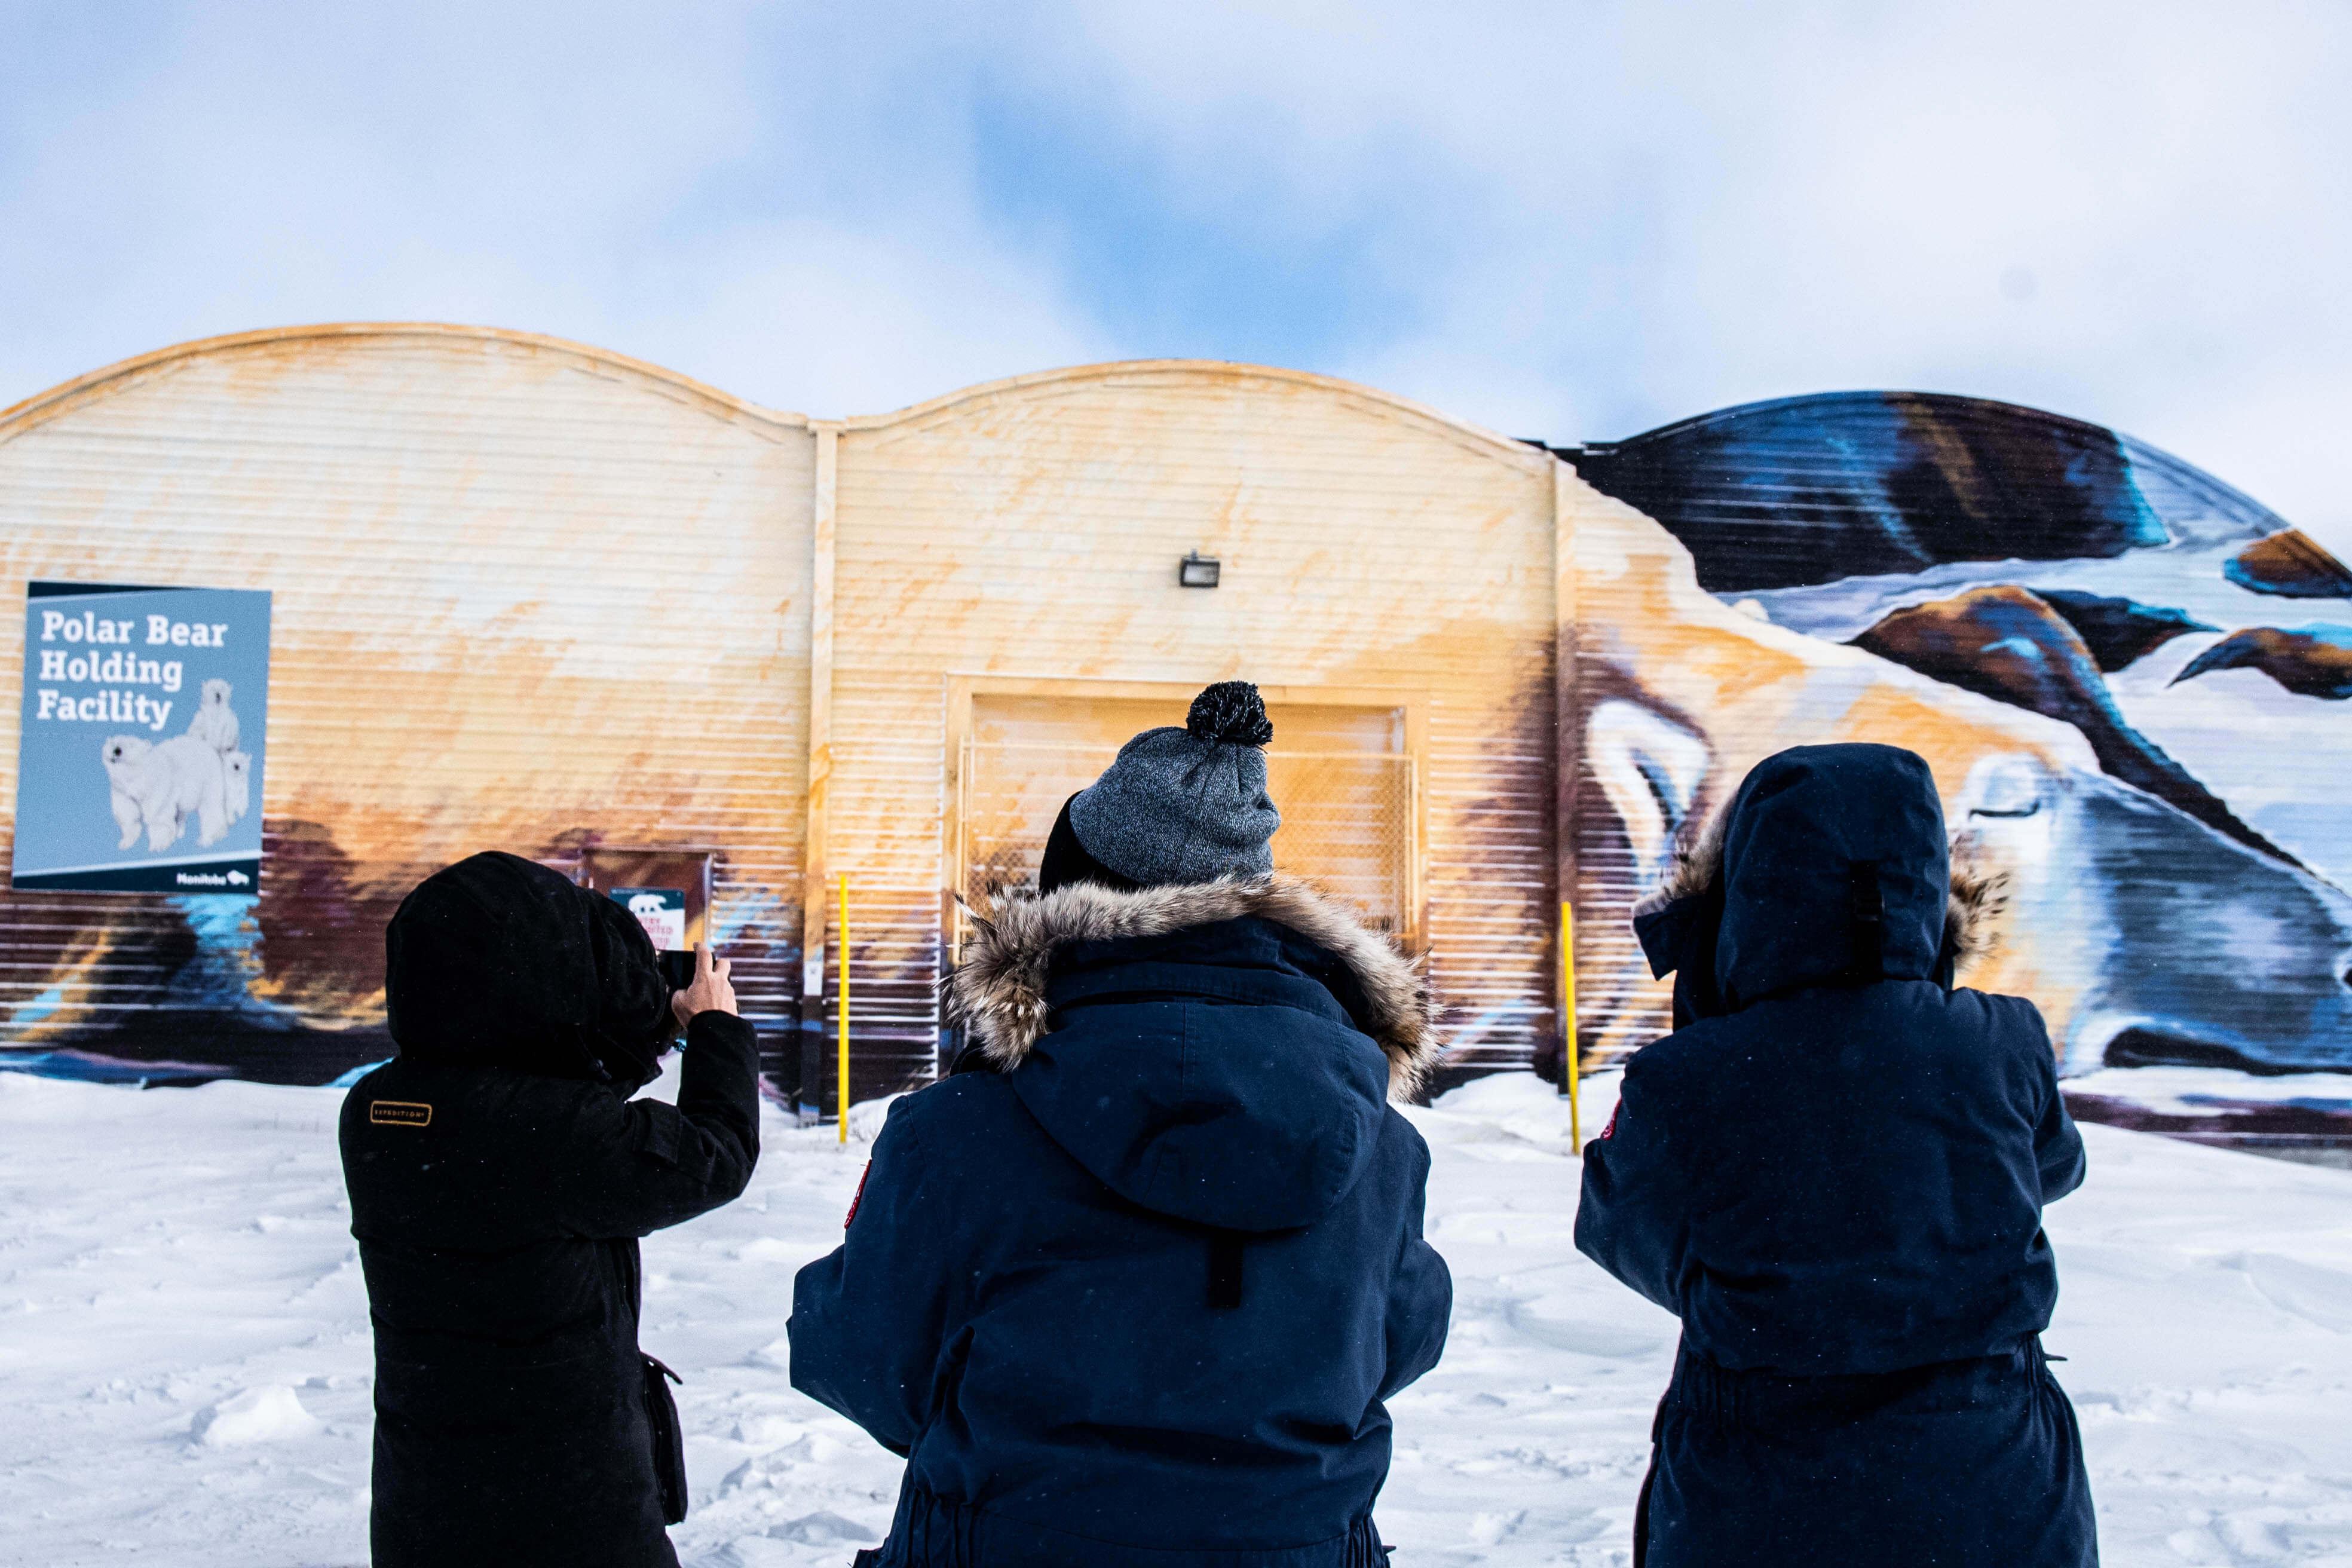 The Polar Bear Holding Facility in Churchill, Canada